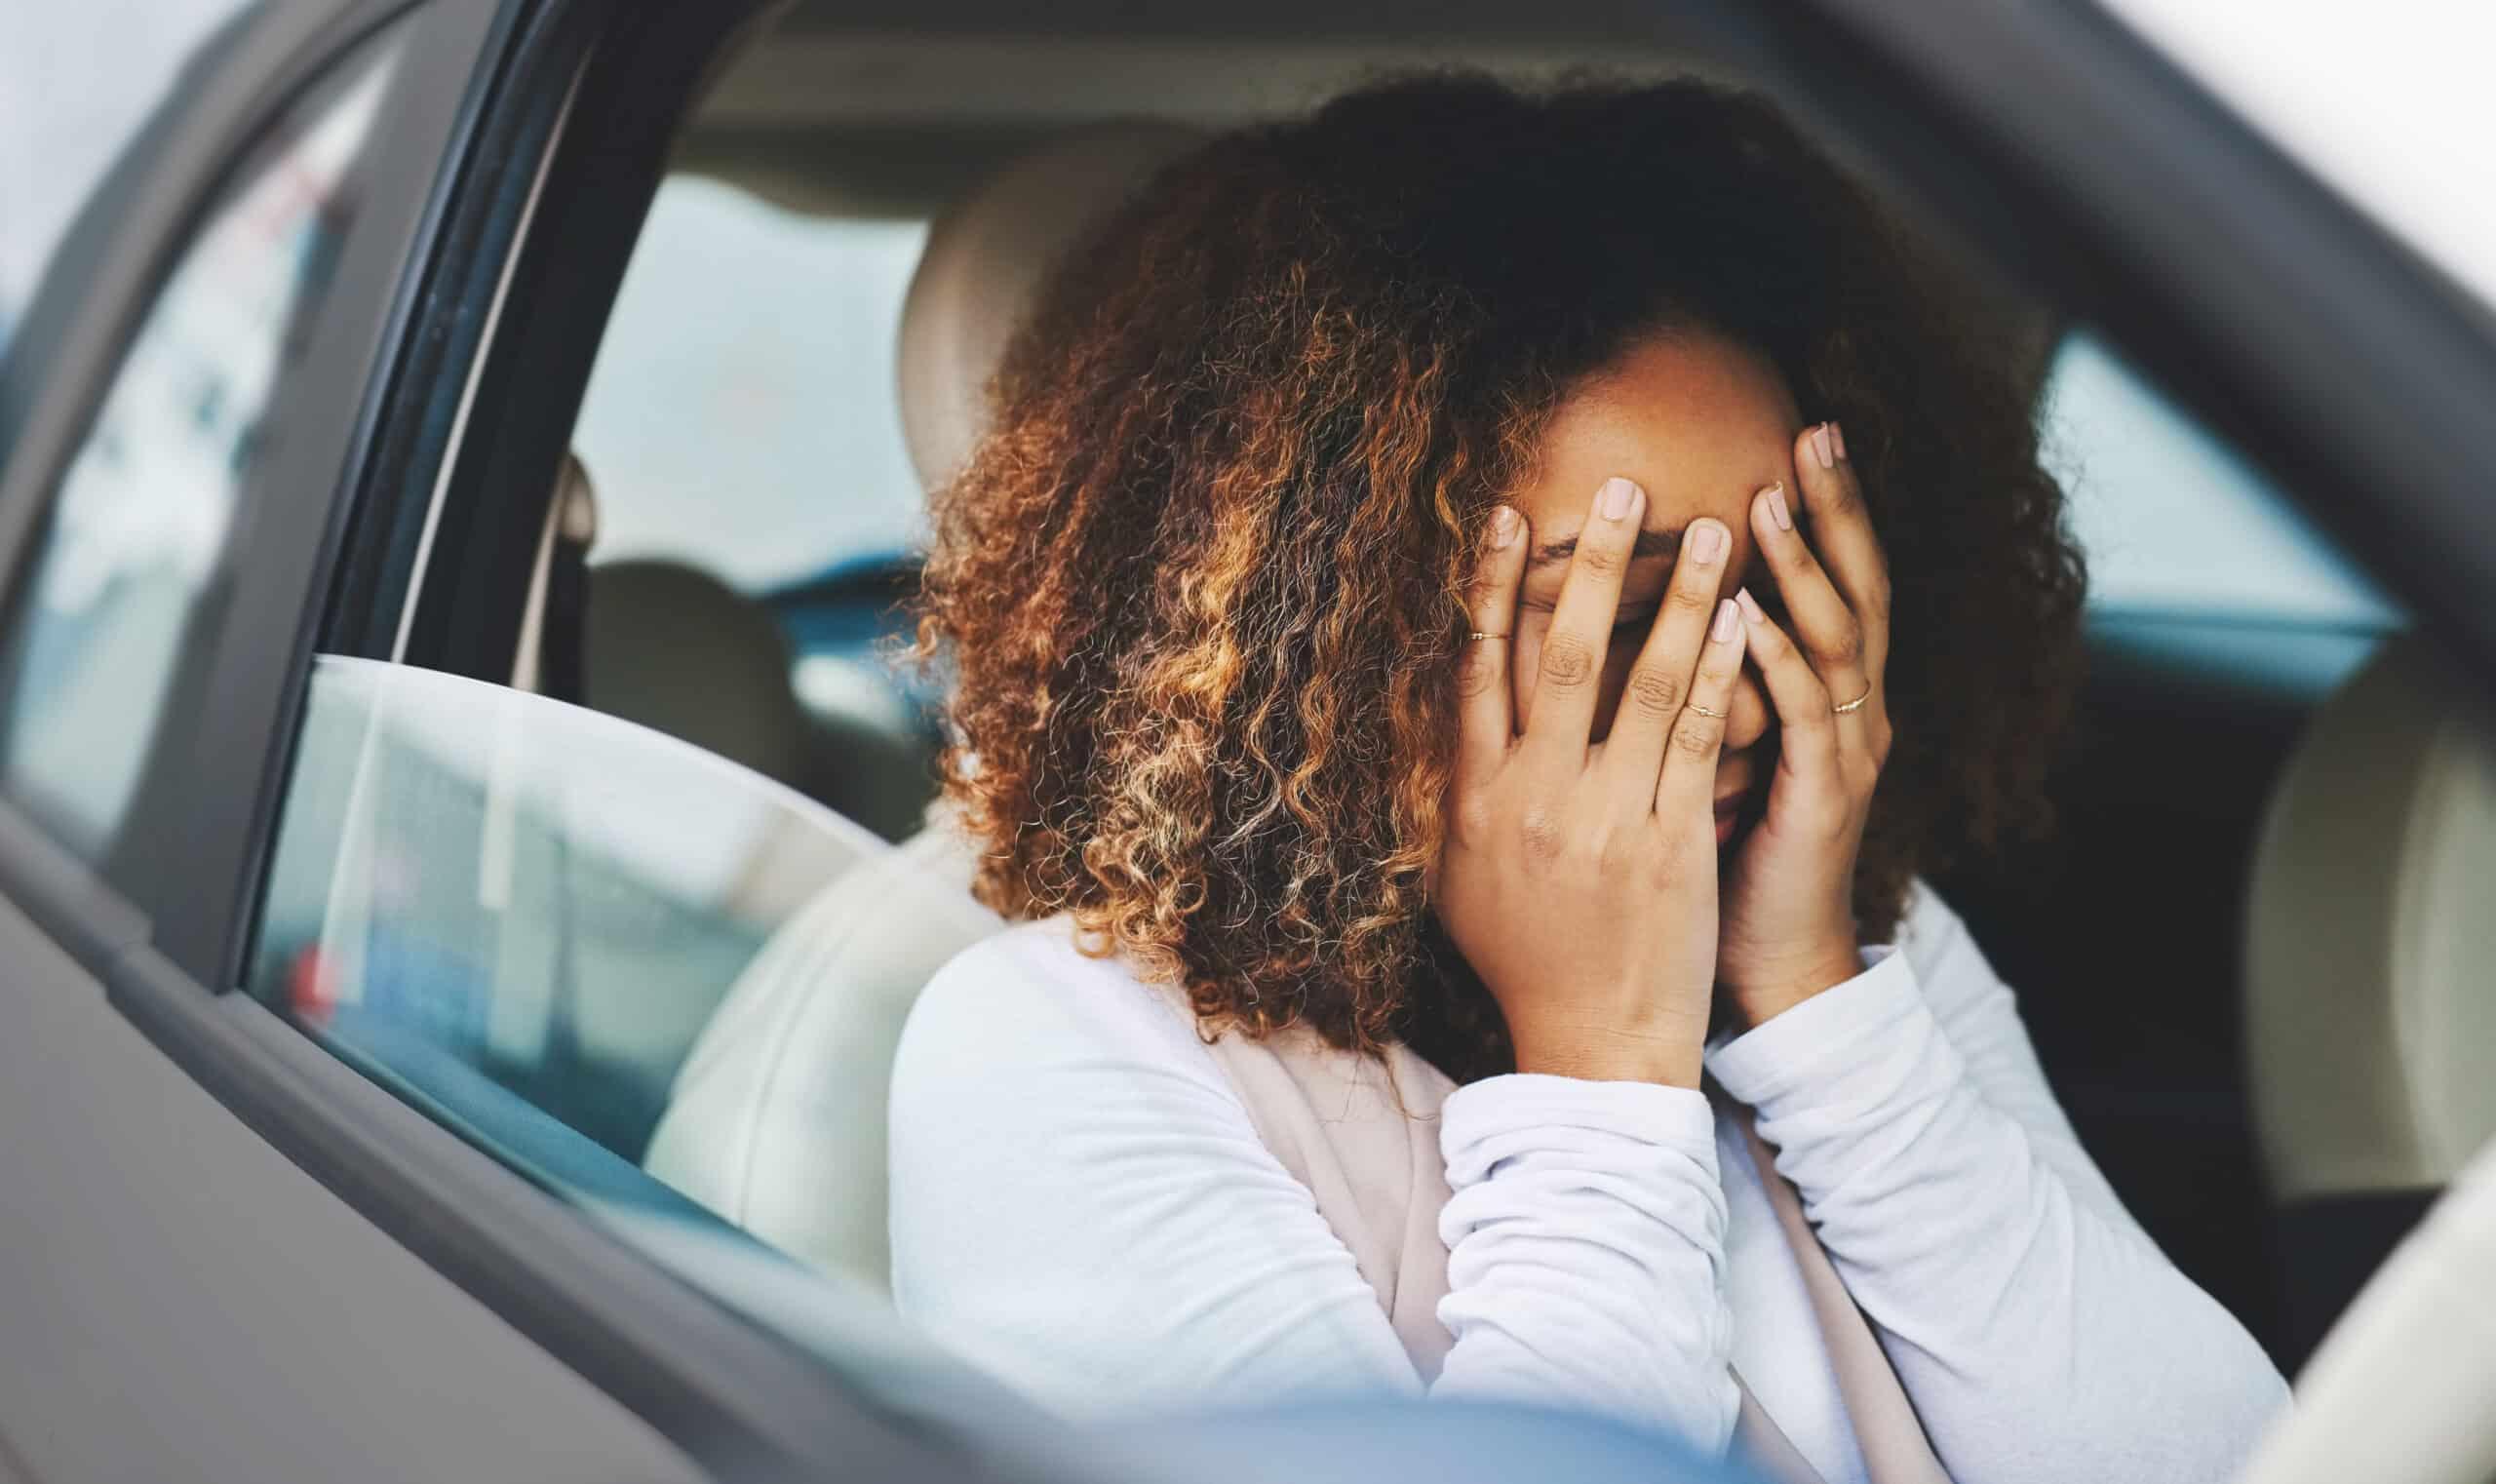 How do Anxiety Symptoms Manifest itself?